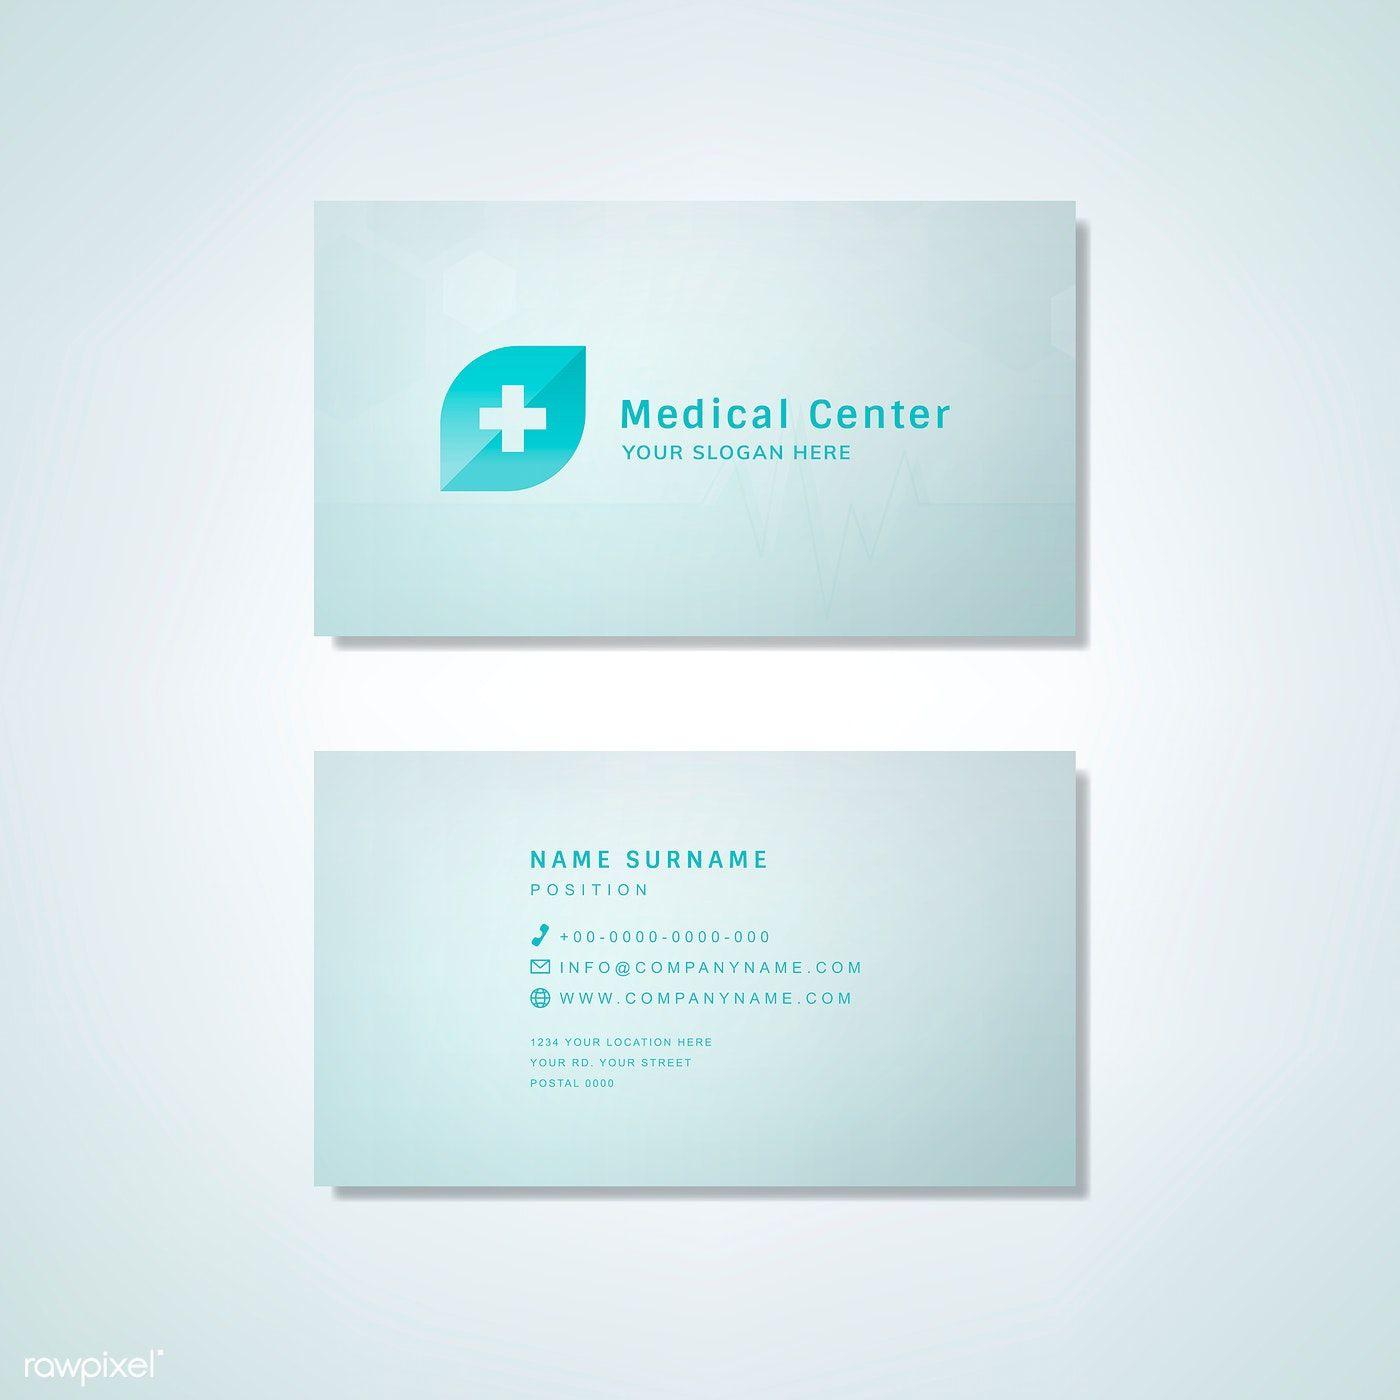 Medical Professional Business Card Design Mockup Free Image By Rawpixel Com Medical Business Card Design Medical Business Card Business Card Design Minimal